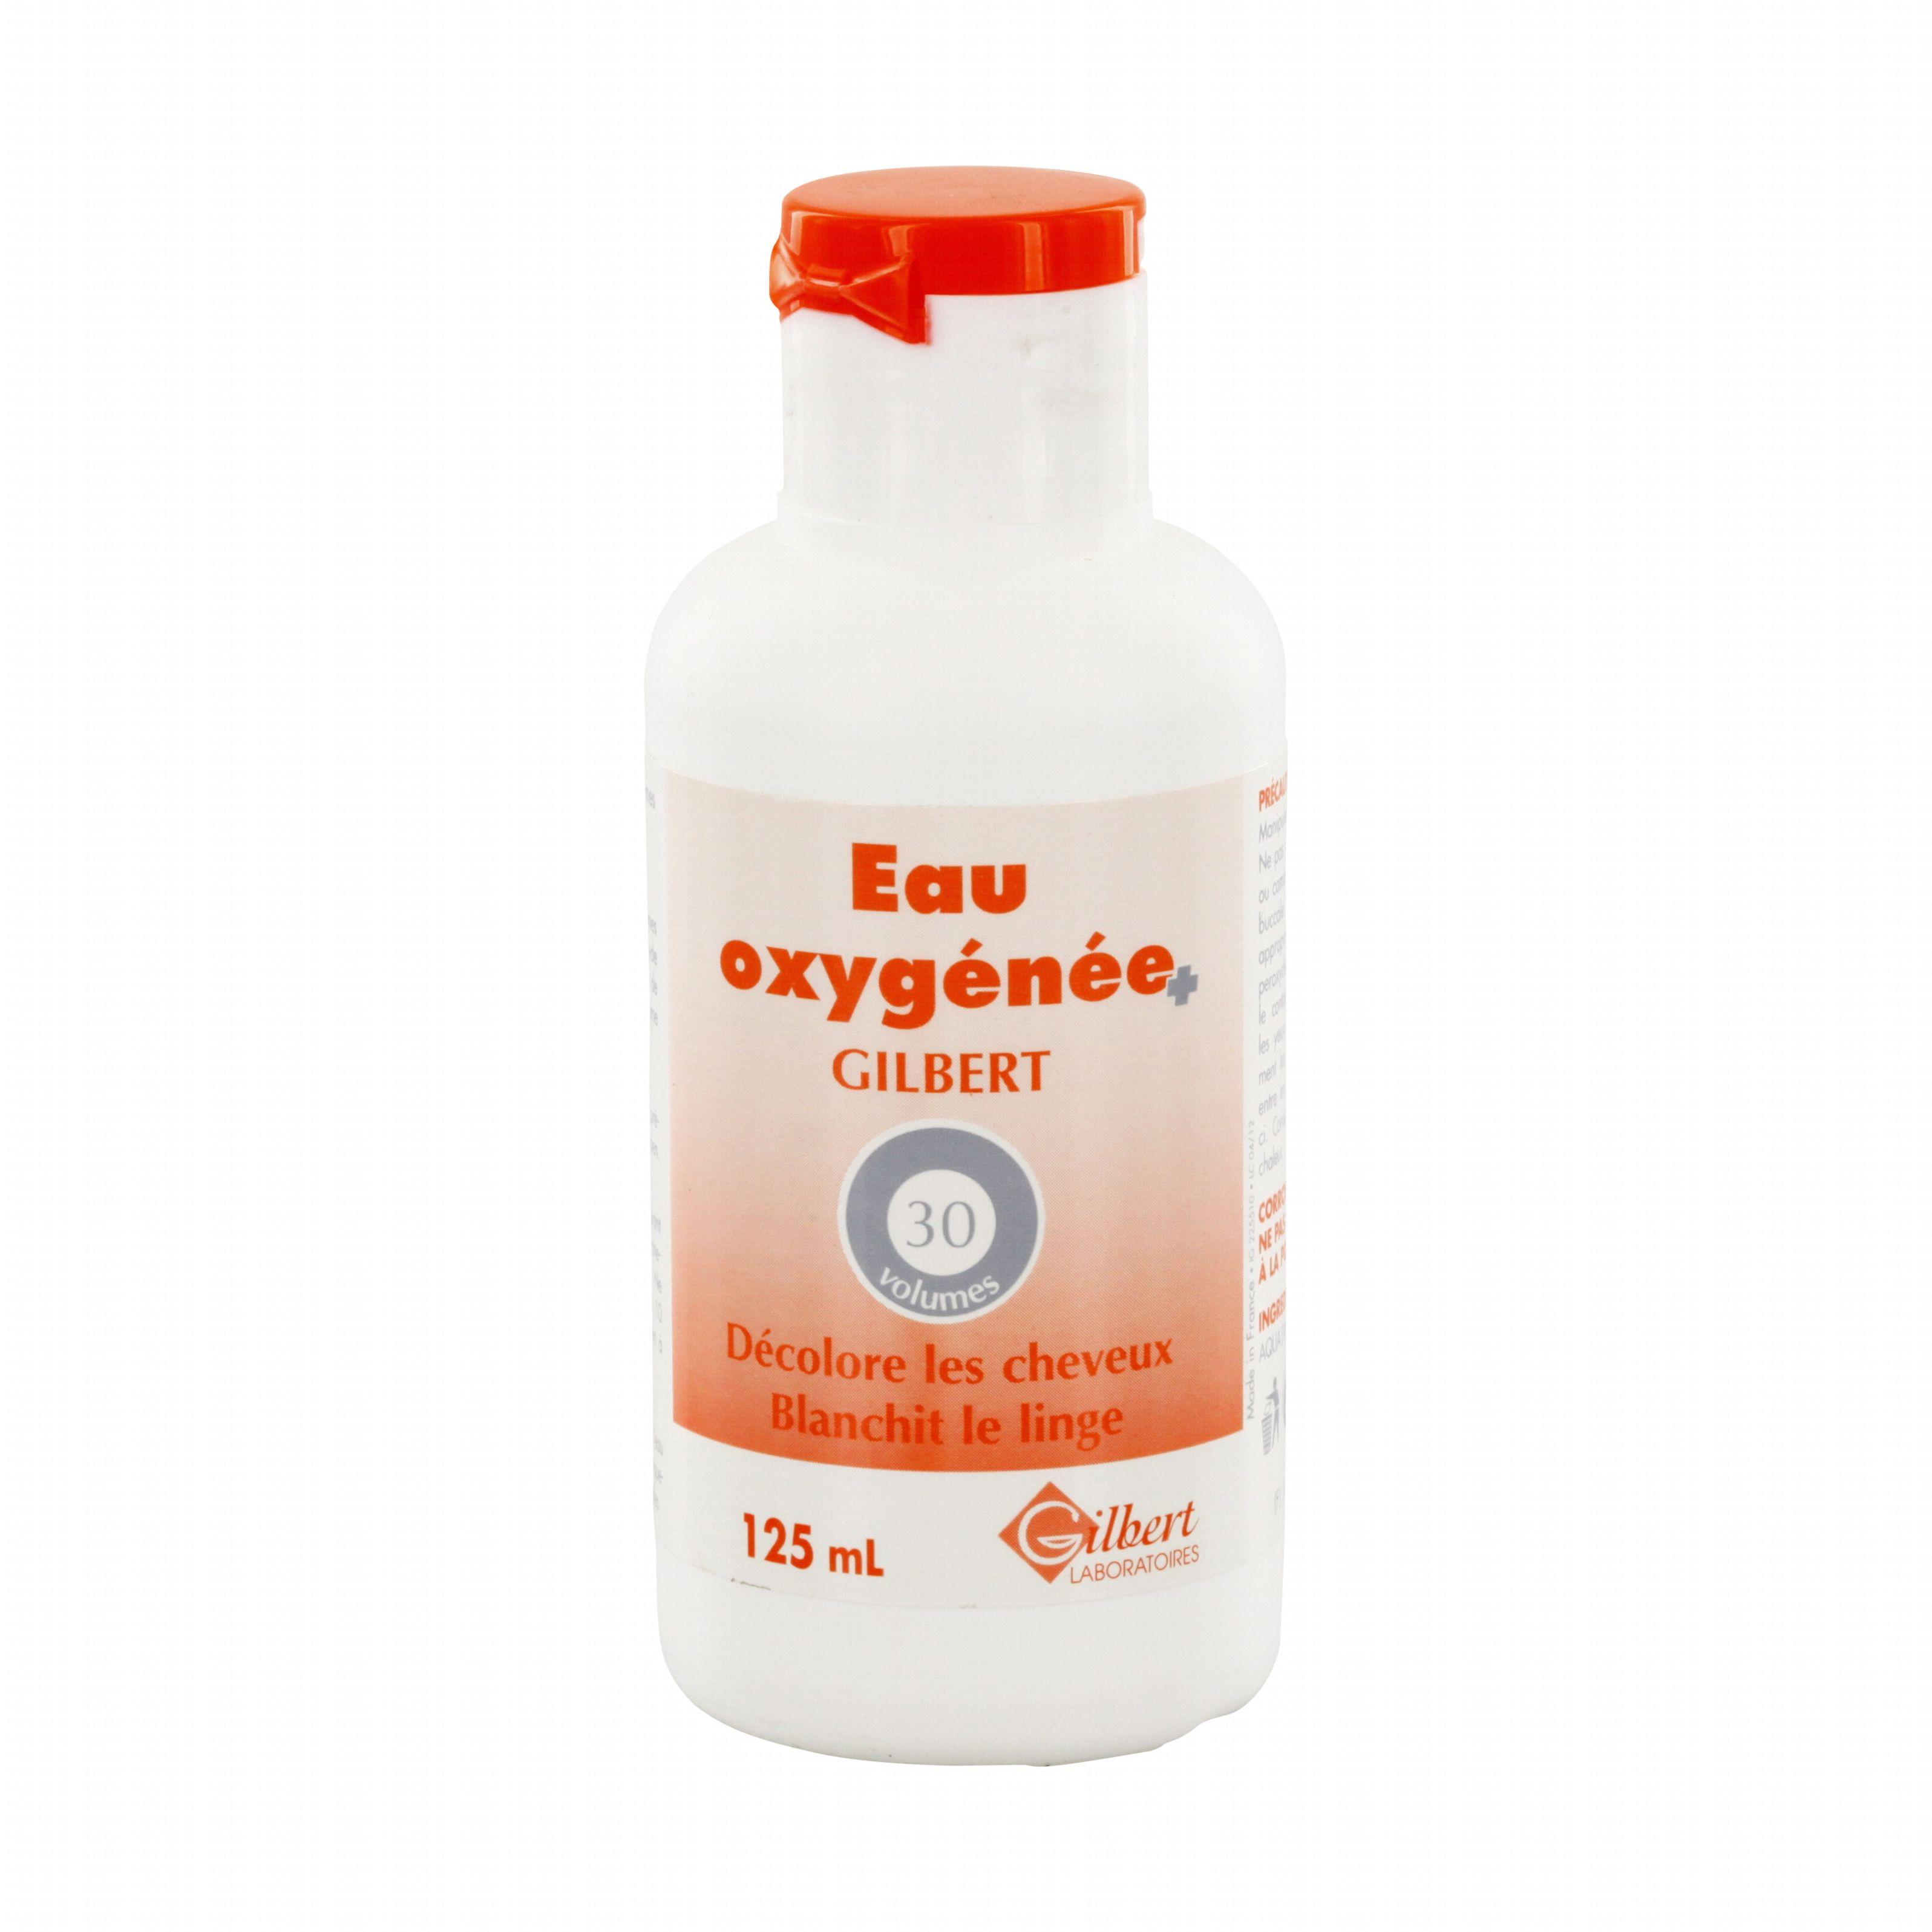 gilbert eau oxyg 233 n 233 e 30 volumes flacon 125 ml pharmacie en ligne prado mermoz